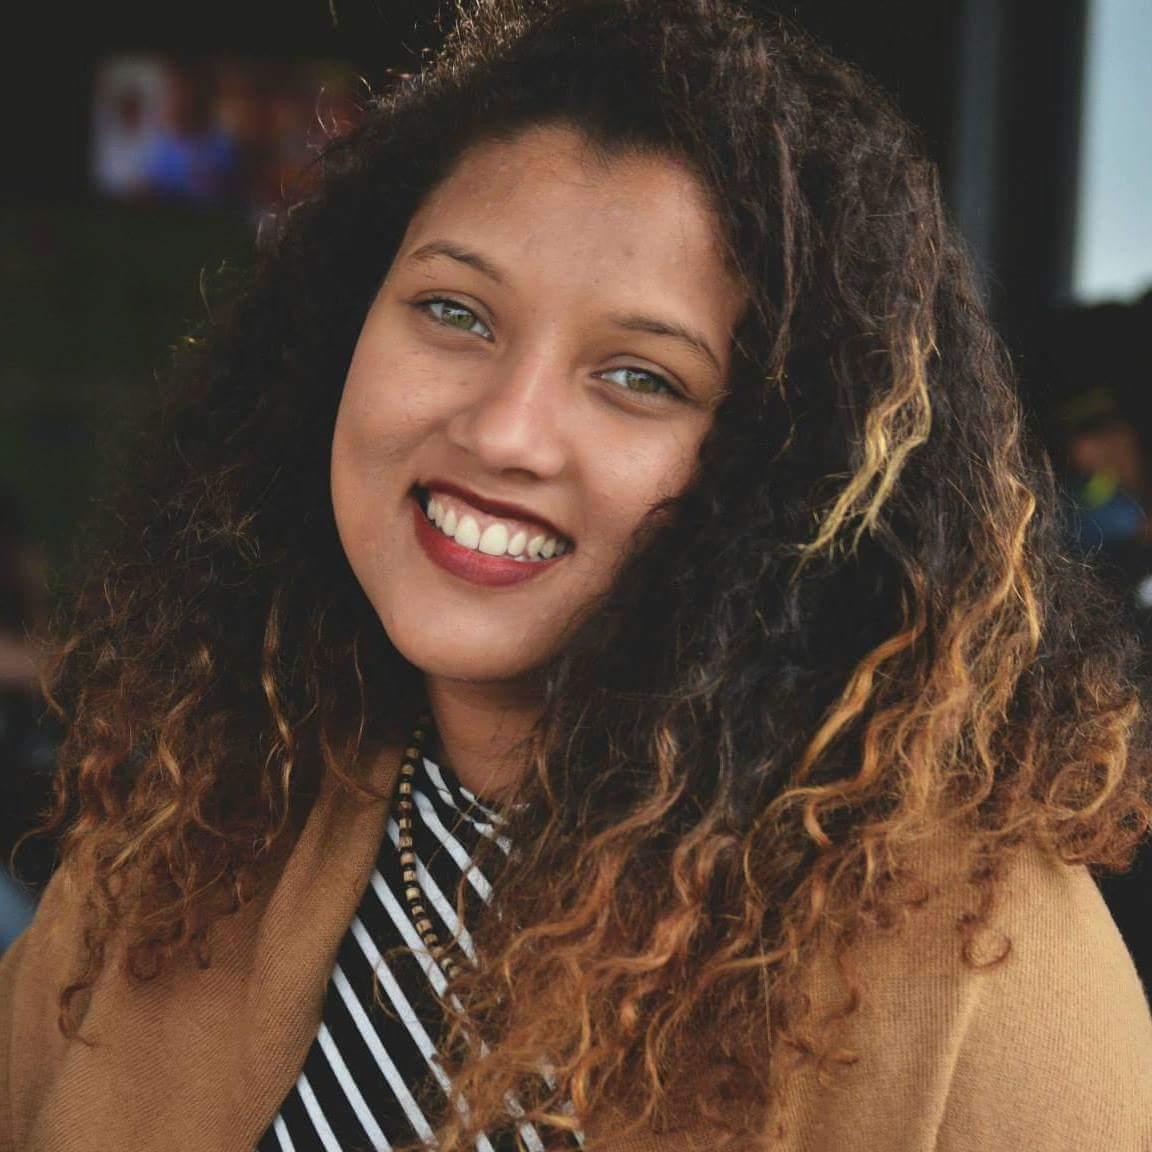 Zoe Postman (University of Cape Town)